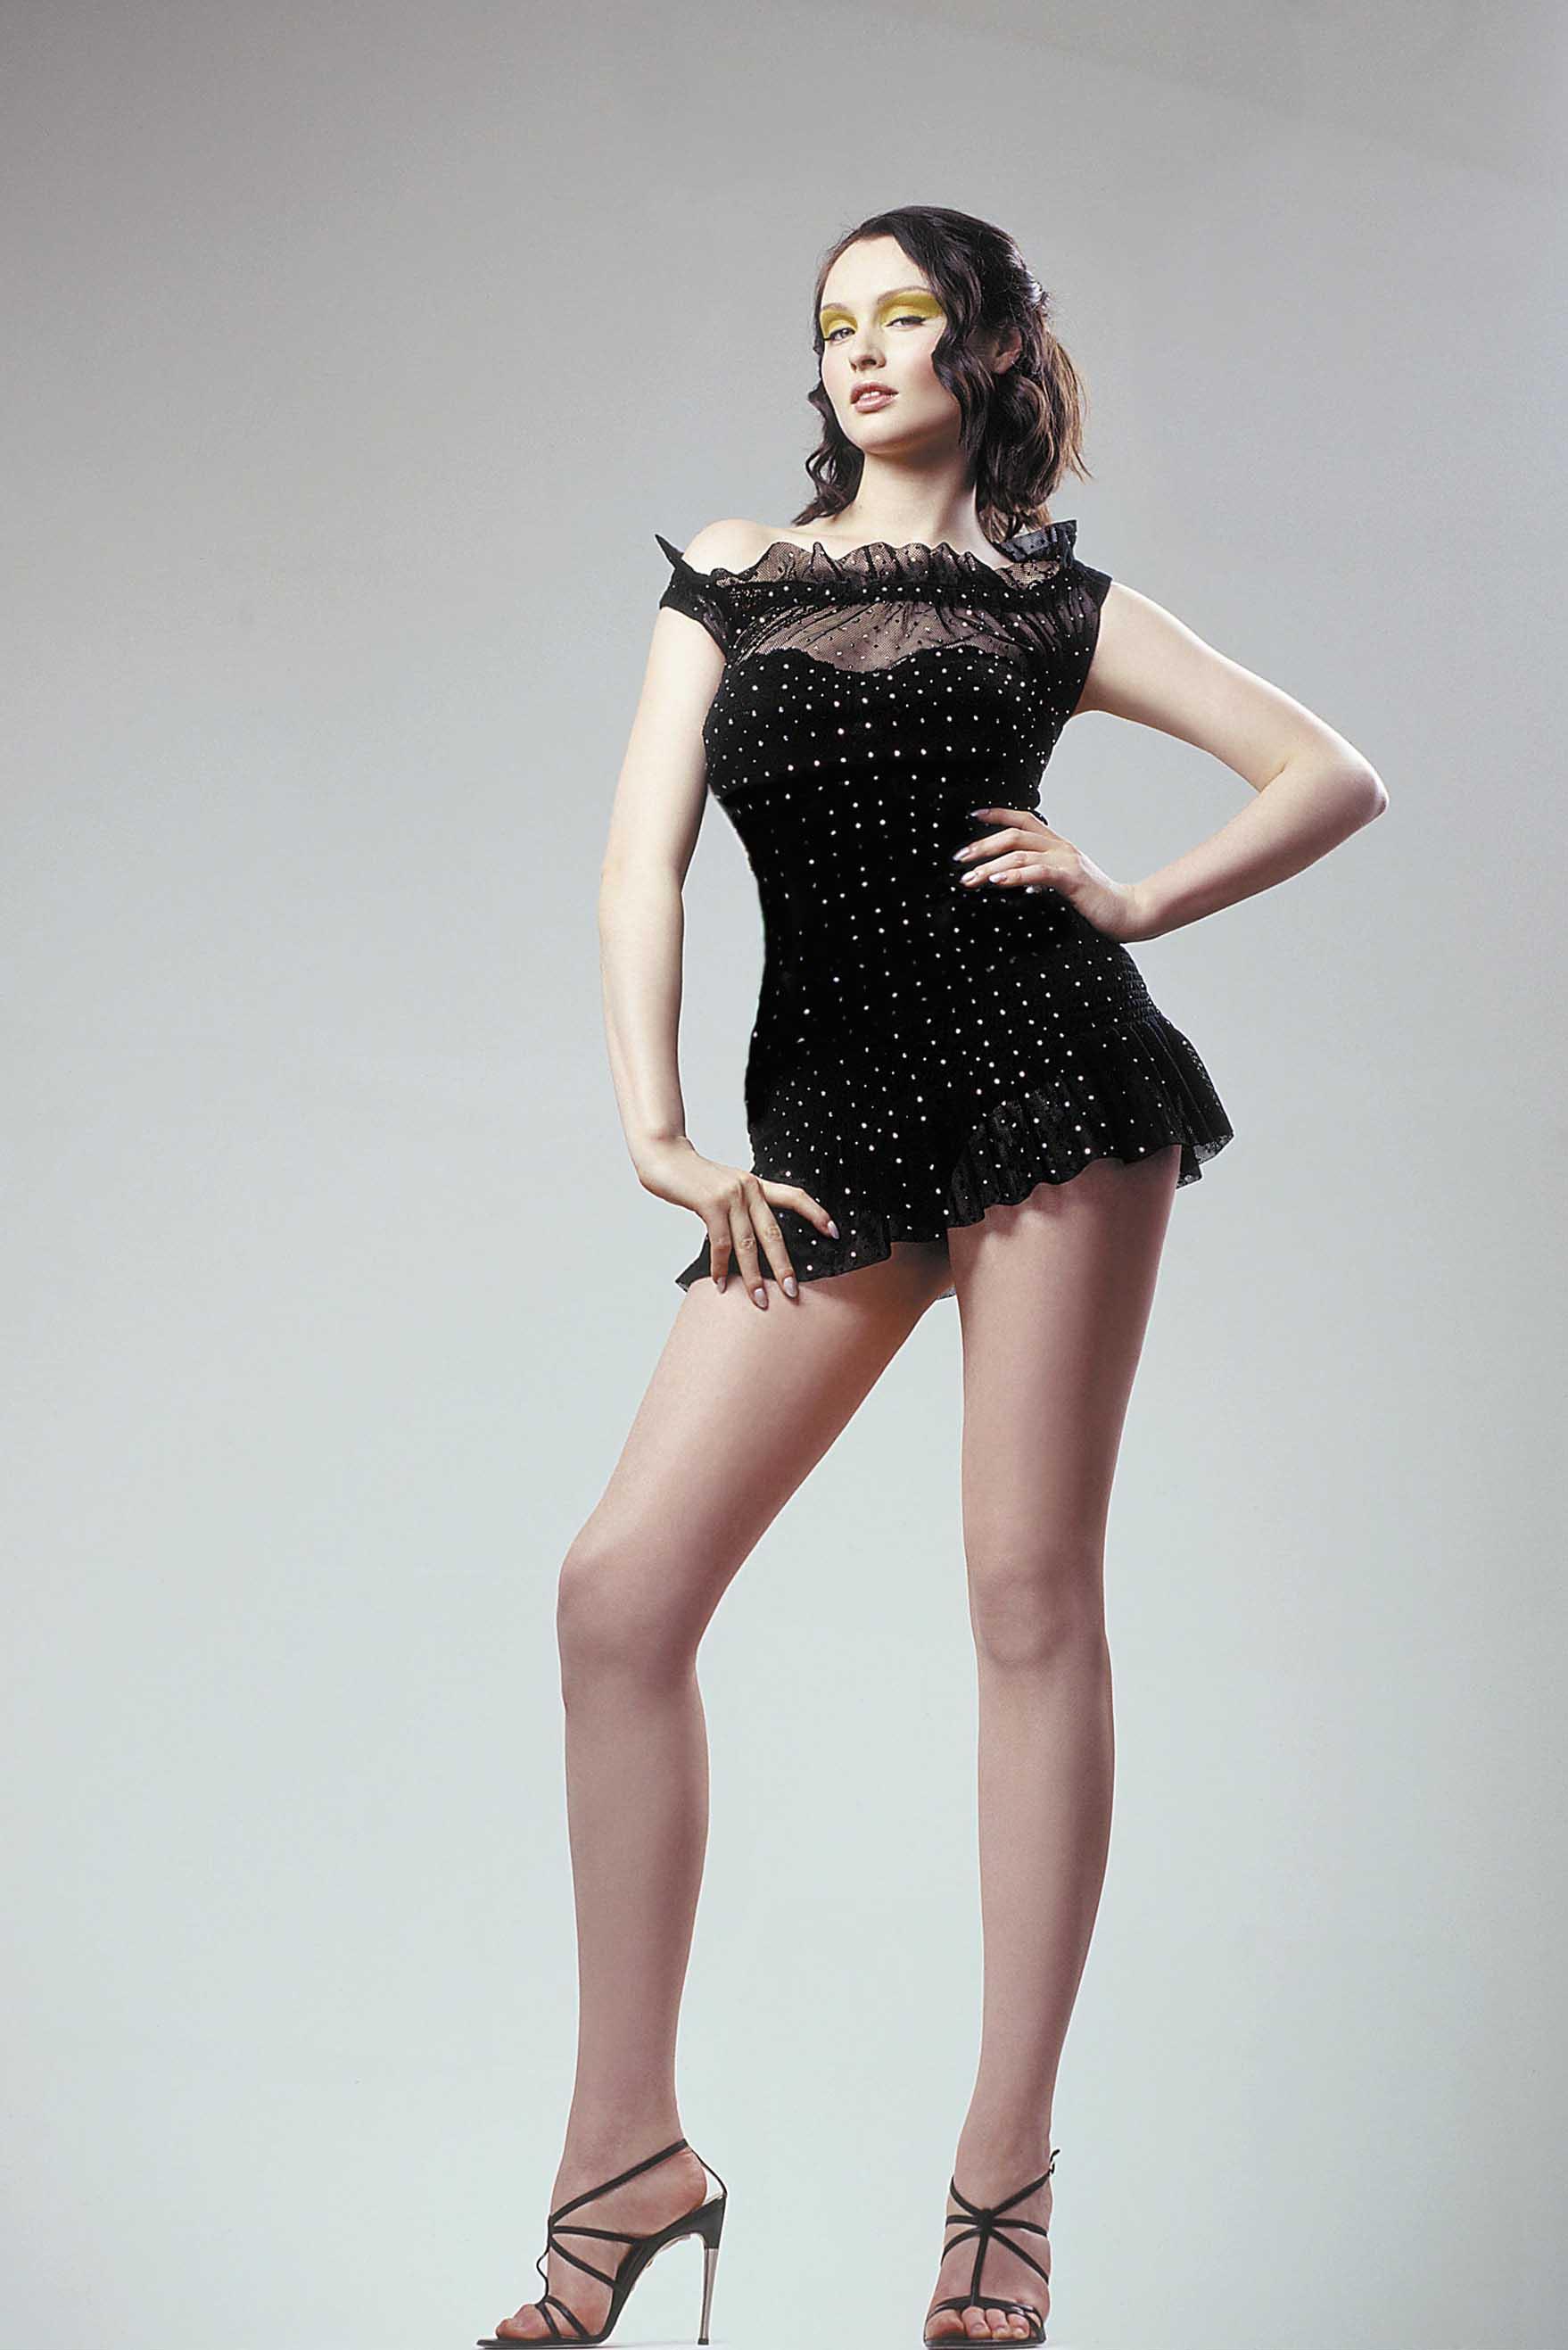 Amazing Sophie Ellis-Bextor Pictures & Backgrounds